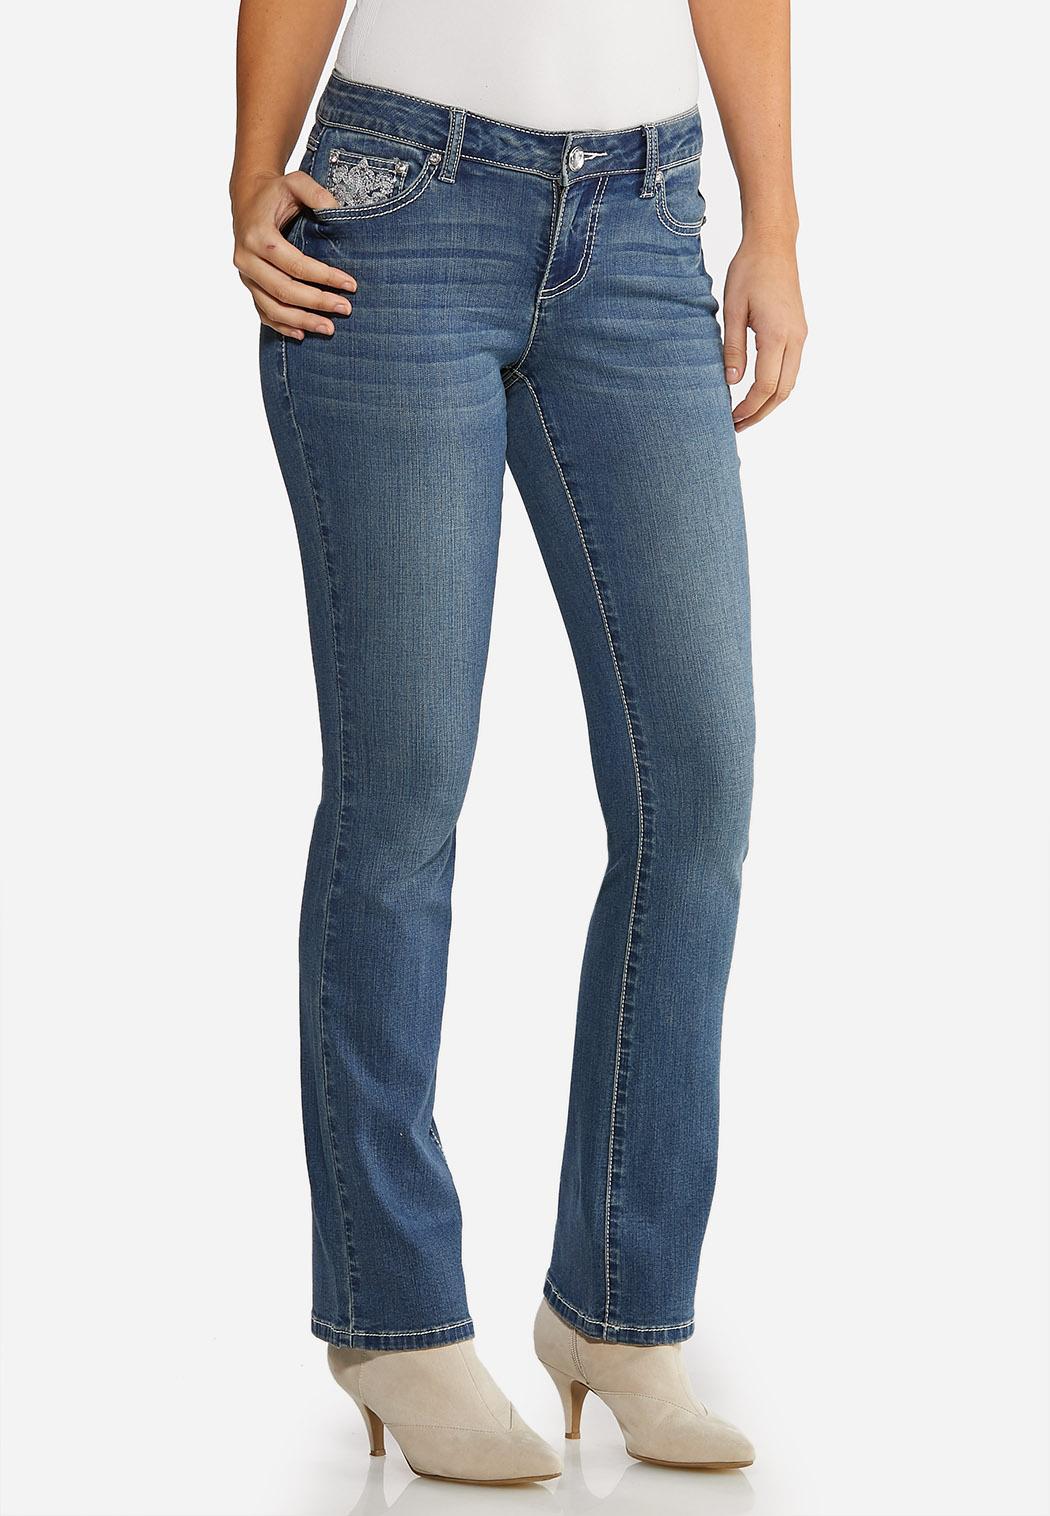 Petite Burst of Bling Bootcut Jeans (Item #44023803)